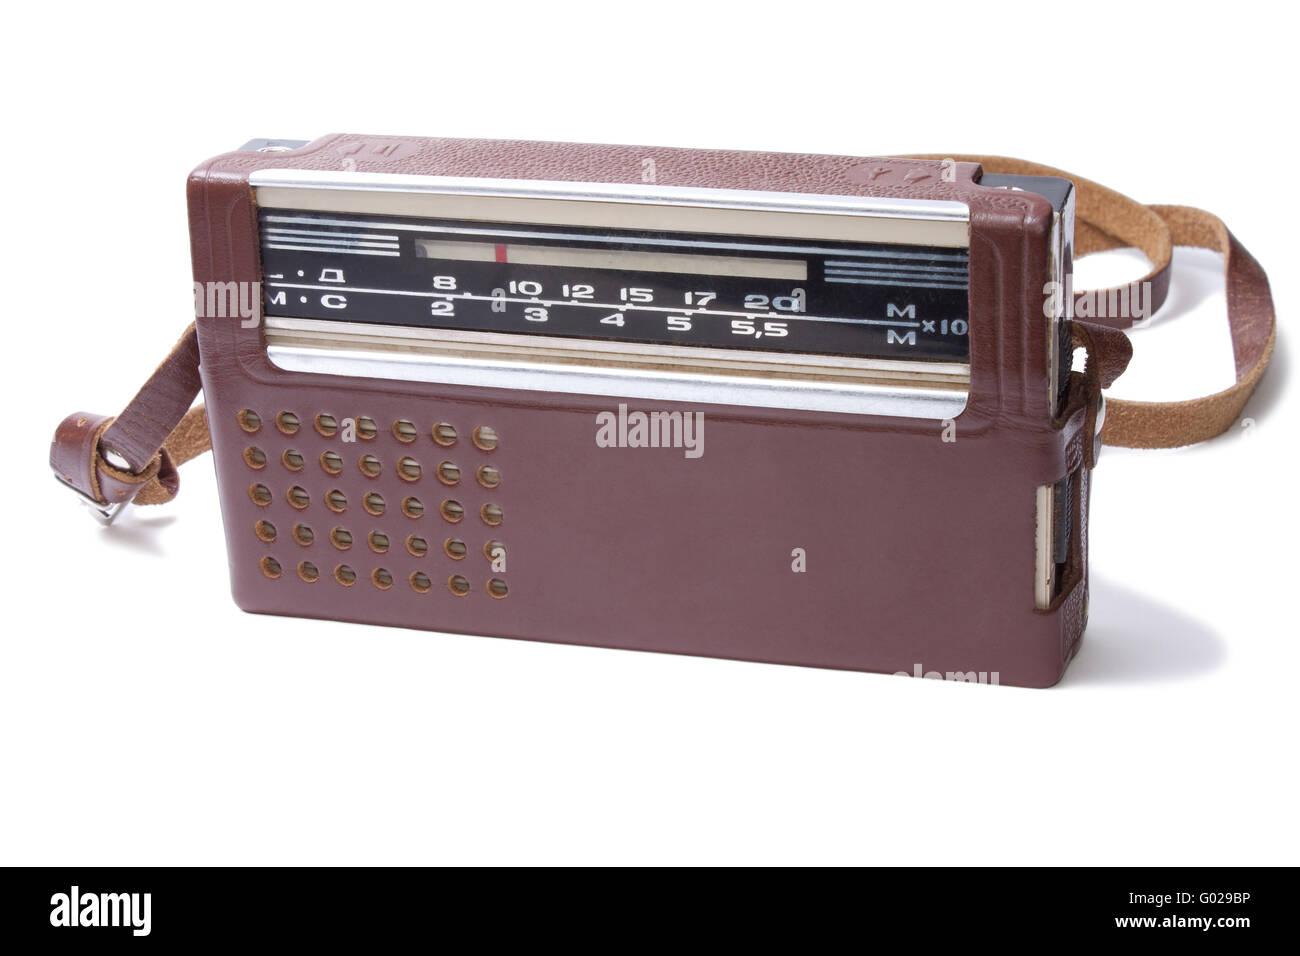 Old Transistor Radio isolated on the white background - Stock Image